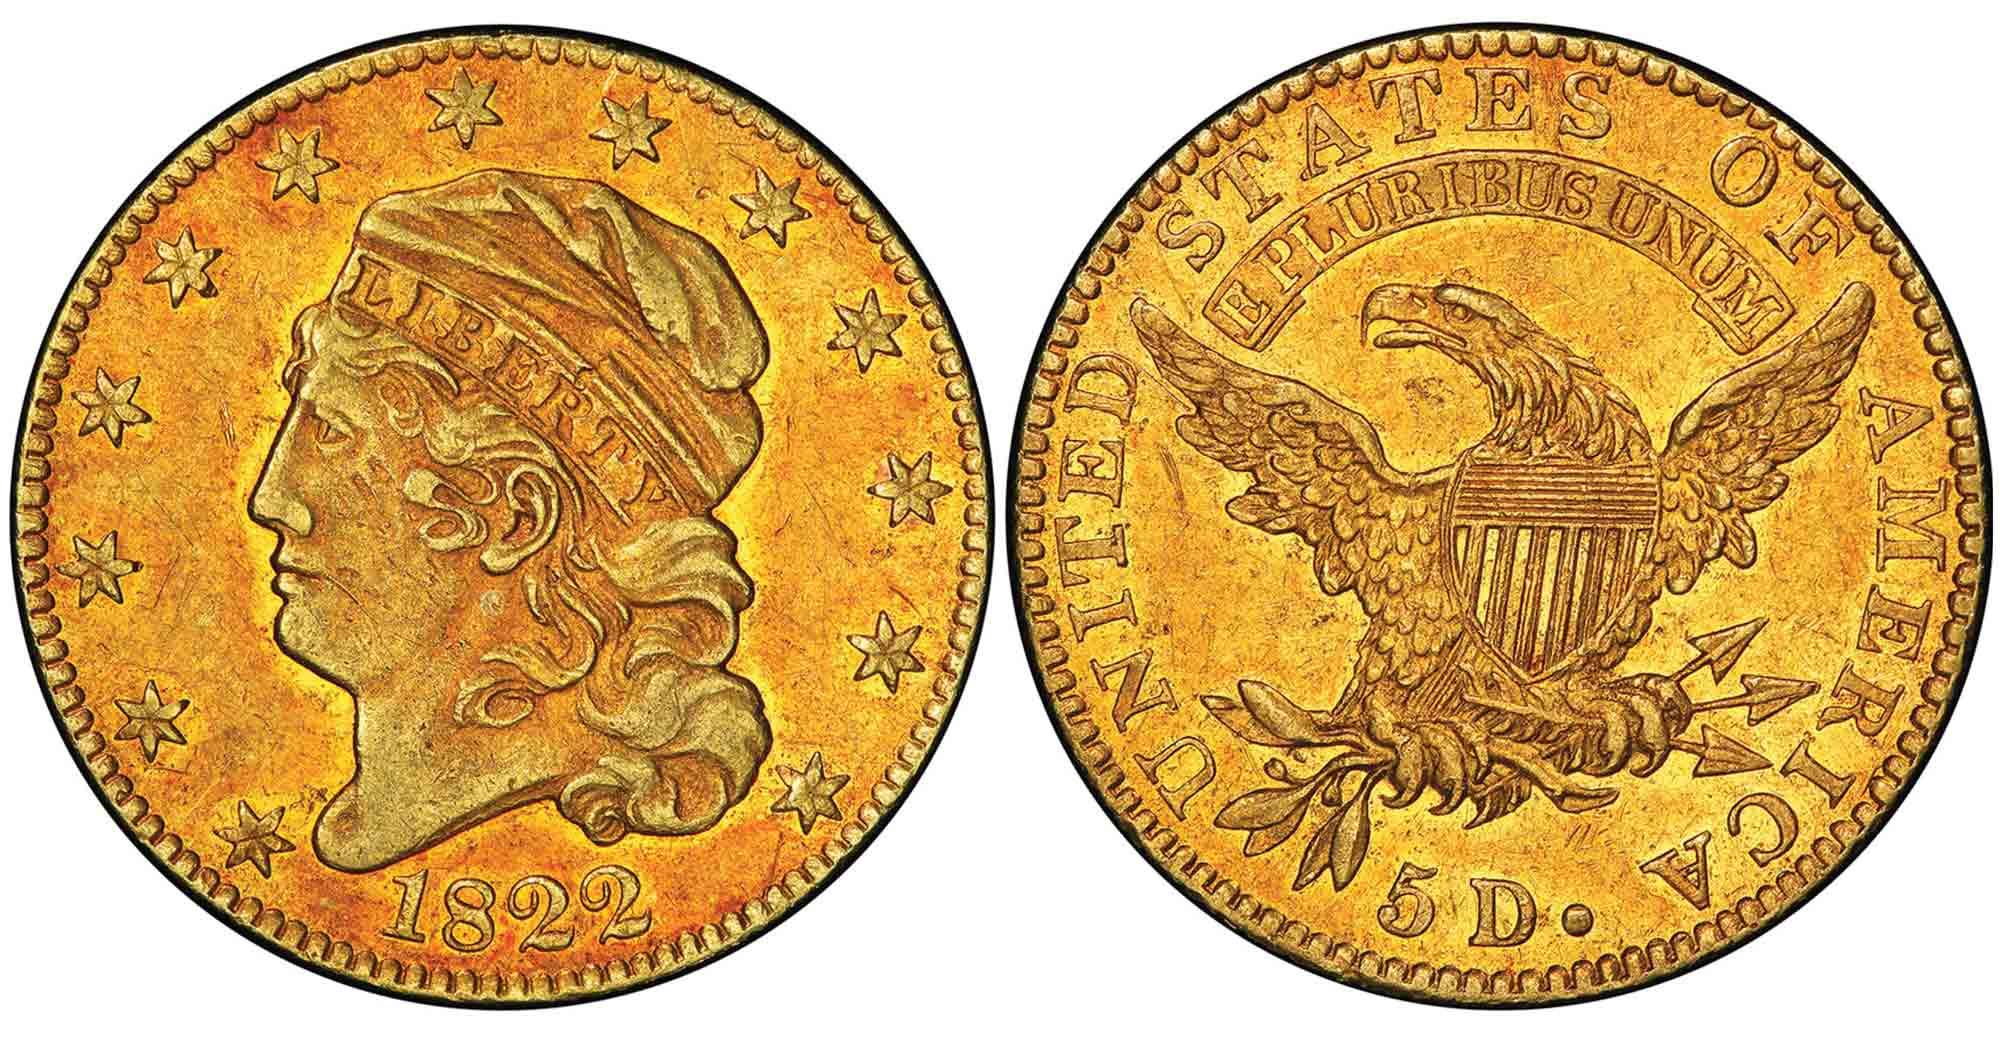 The 1822 half eagle is a legendary American treasure.